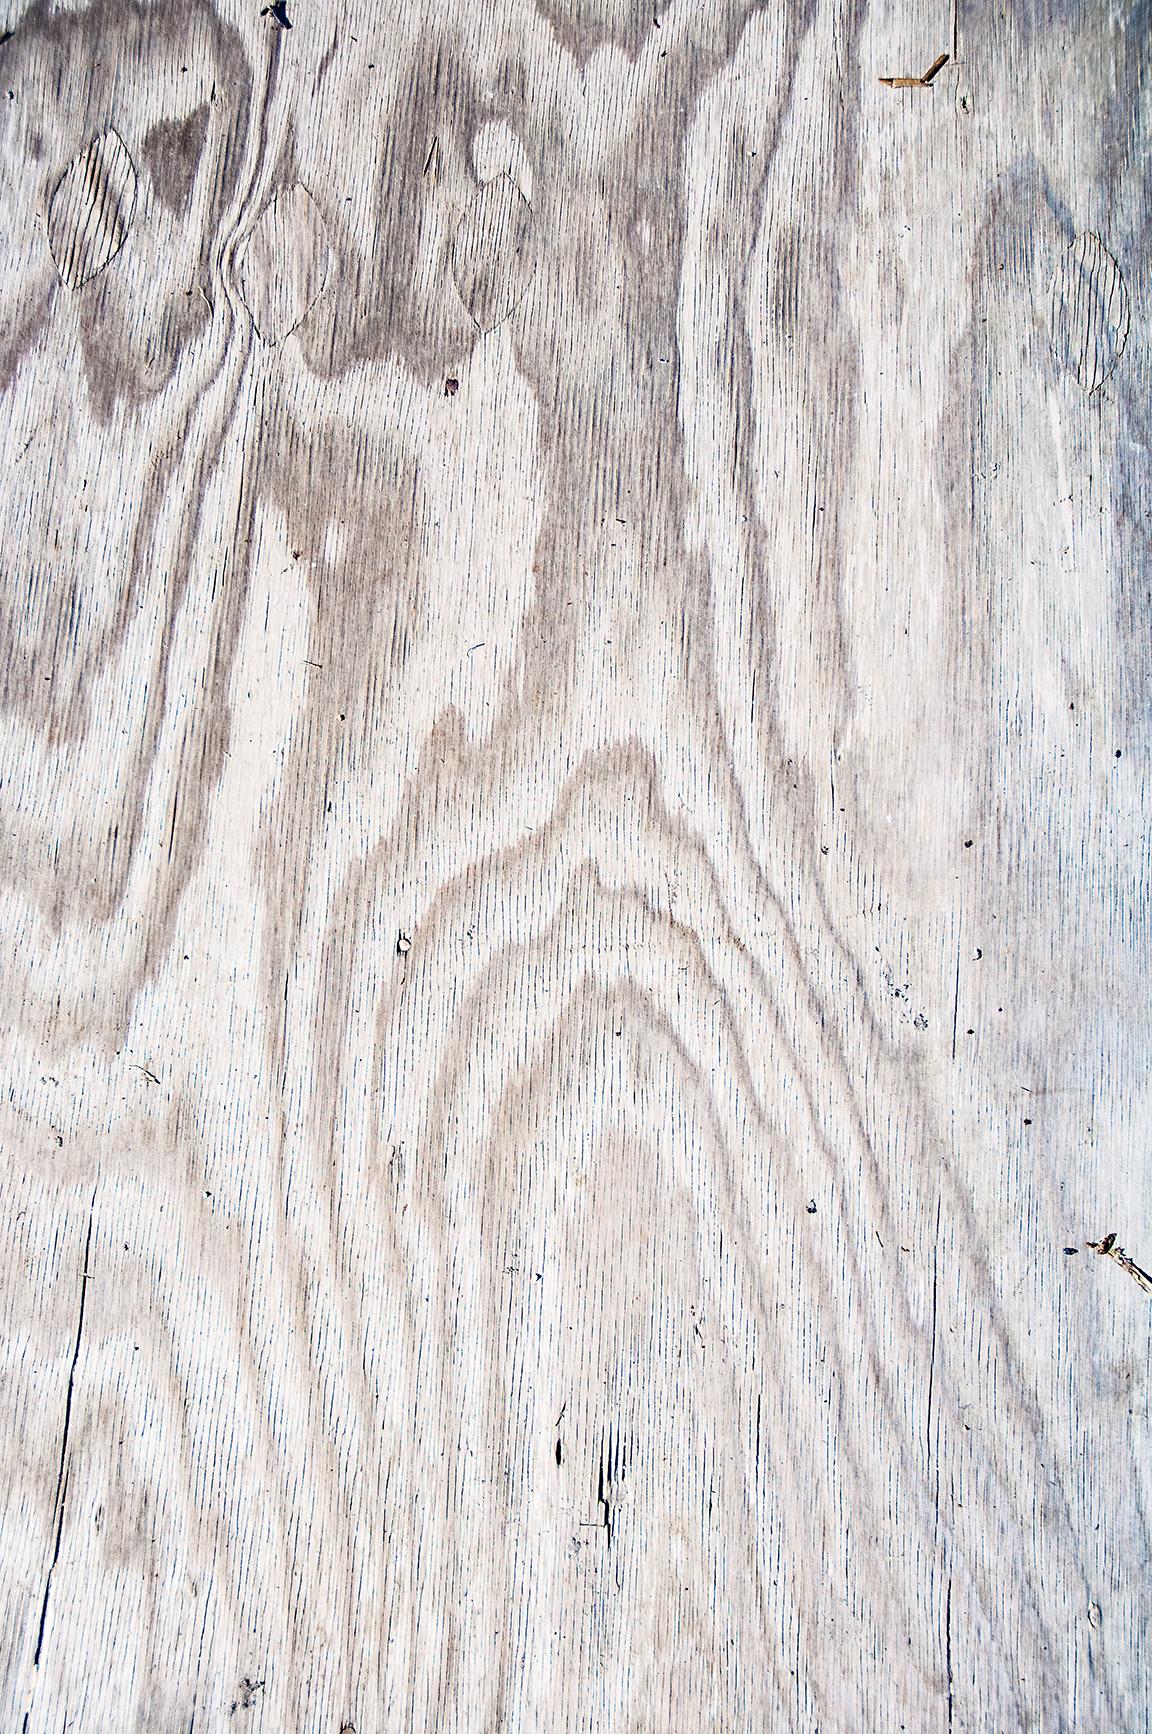 Plywood#1.jpg